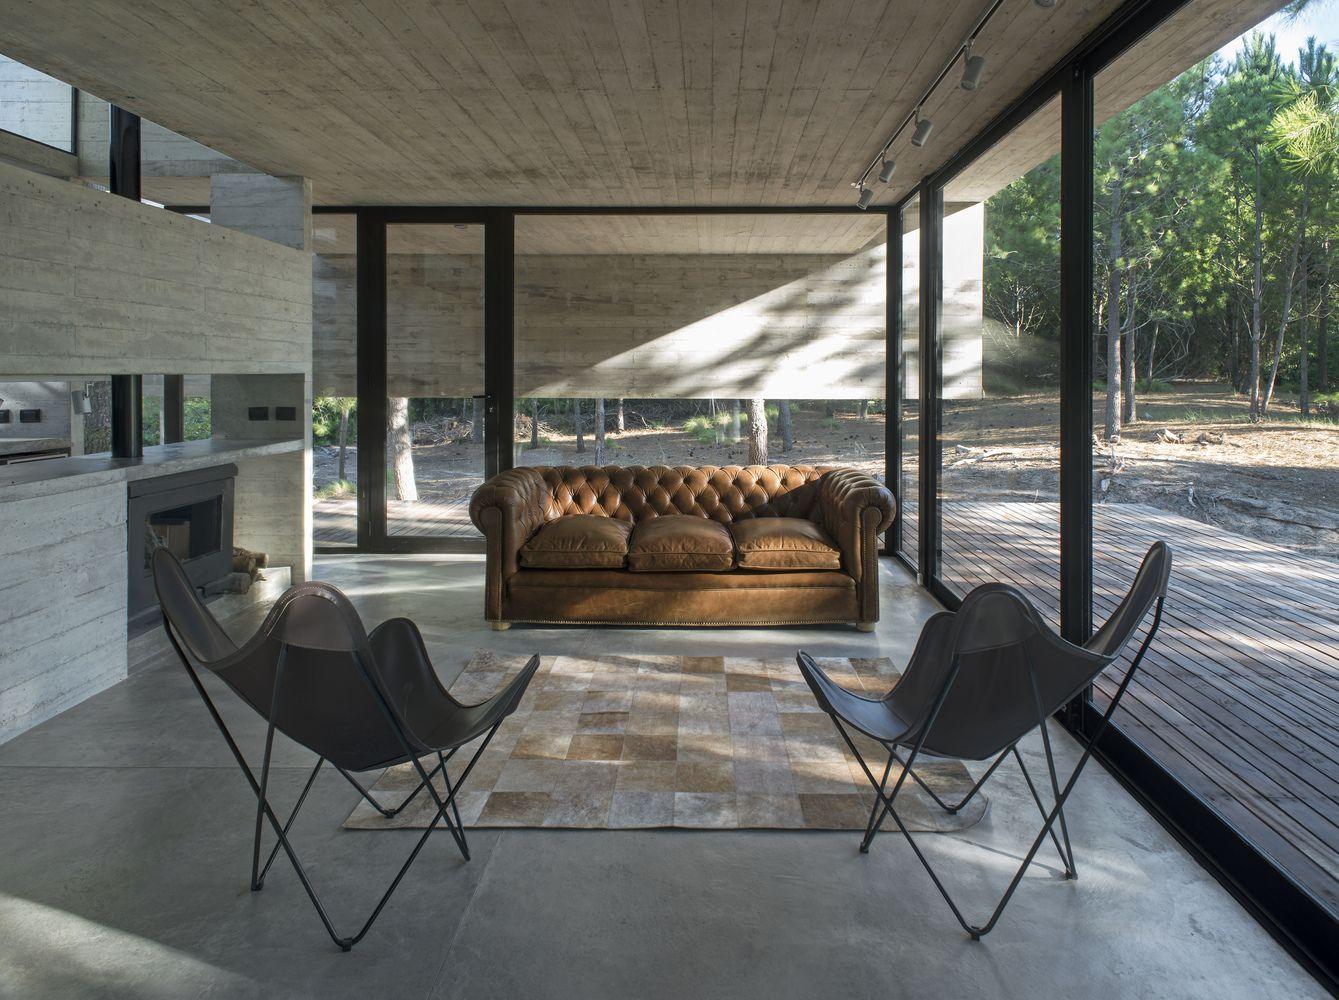 Gallery of SJ House Luciano Kruk